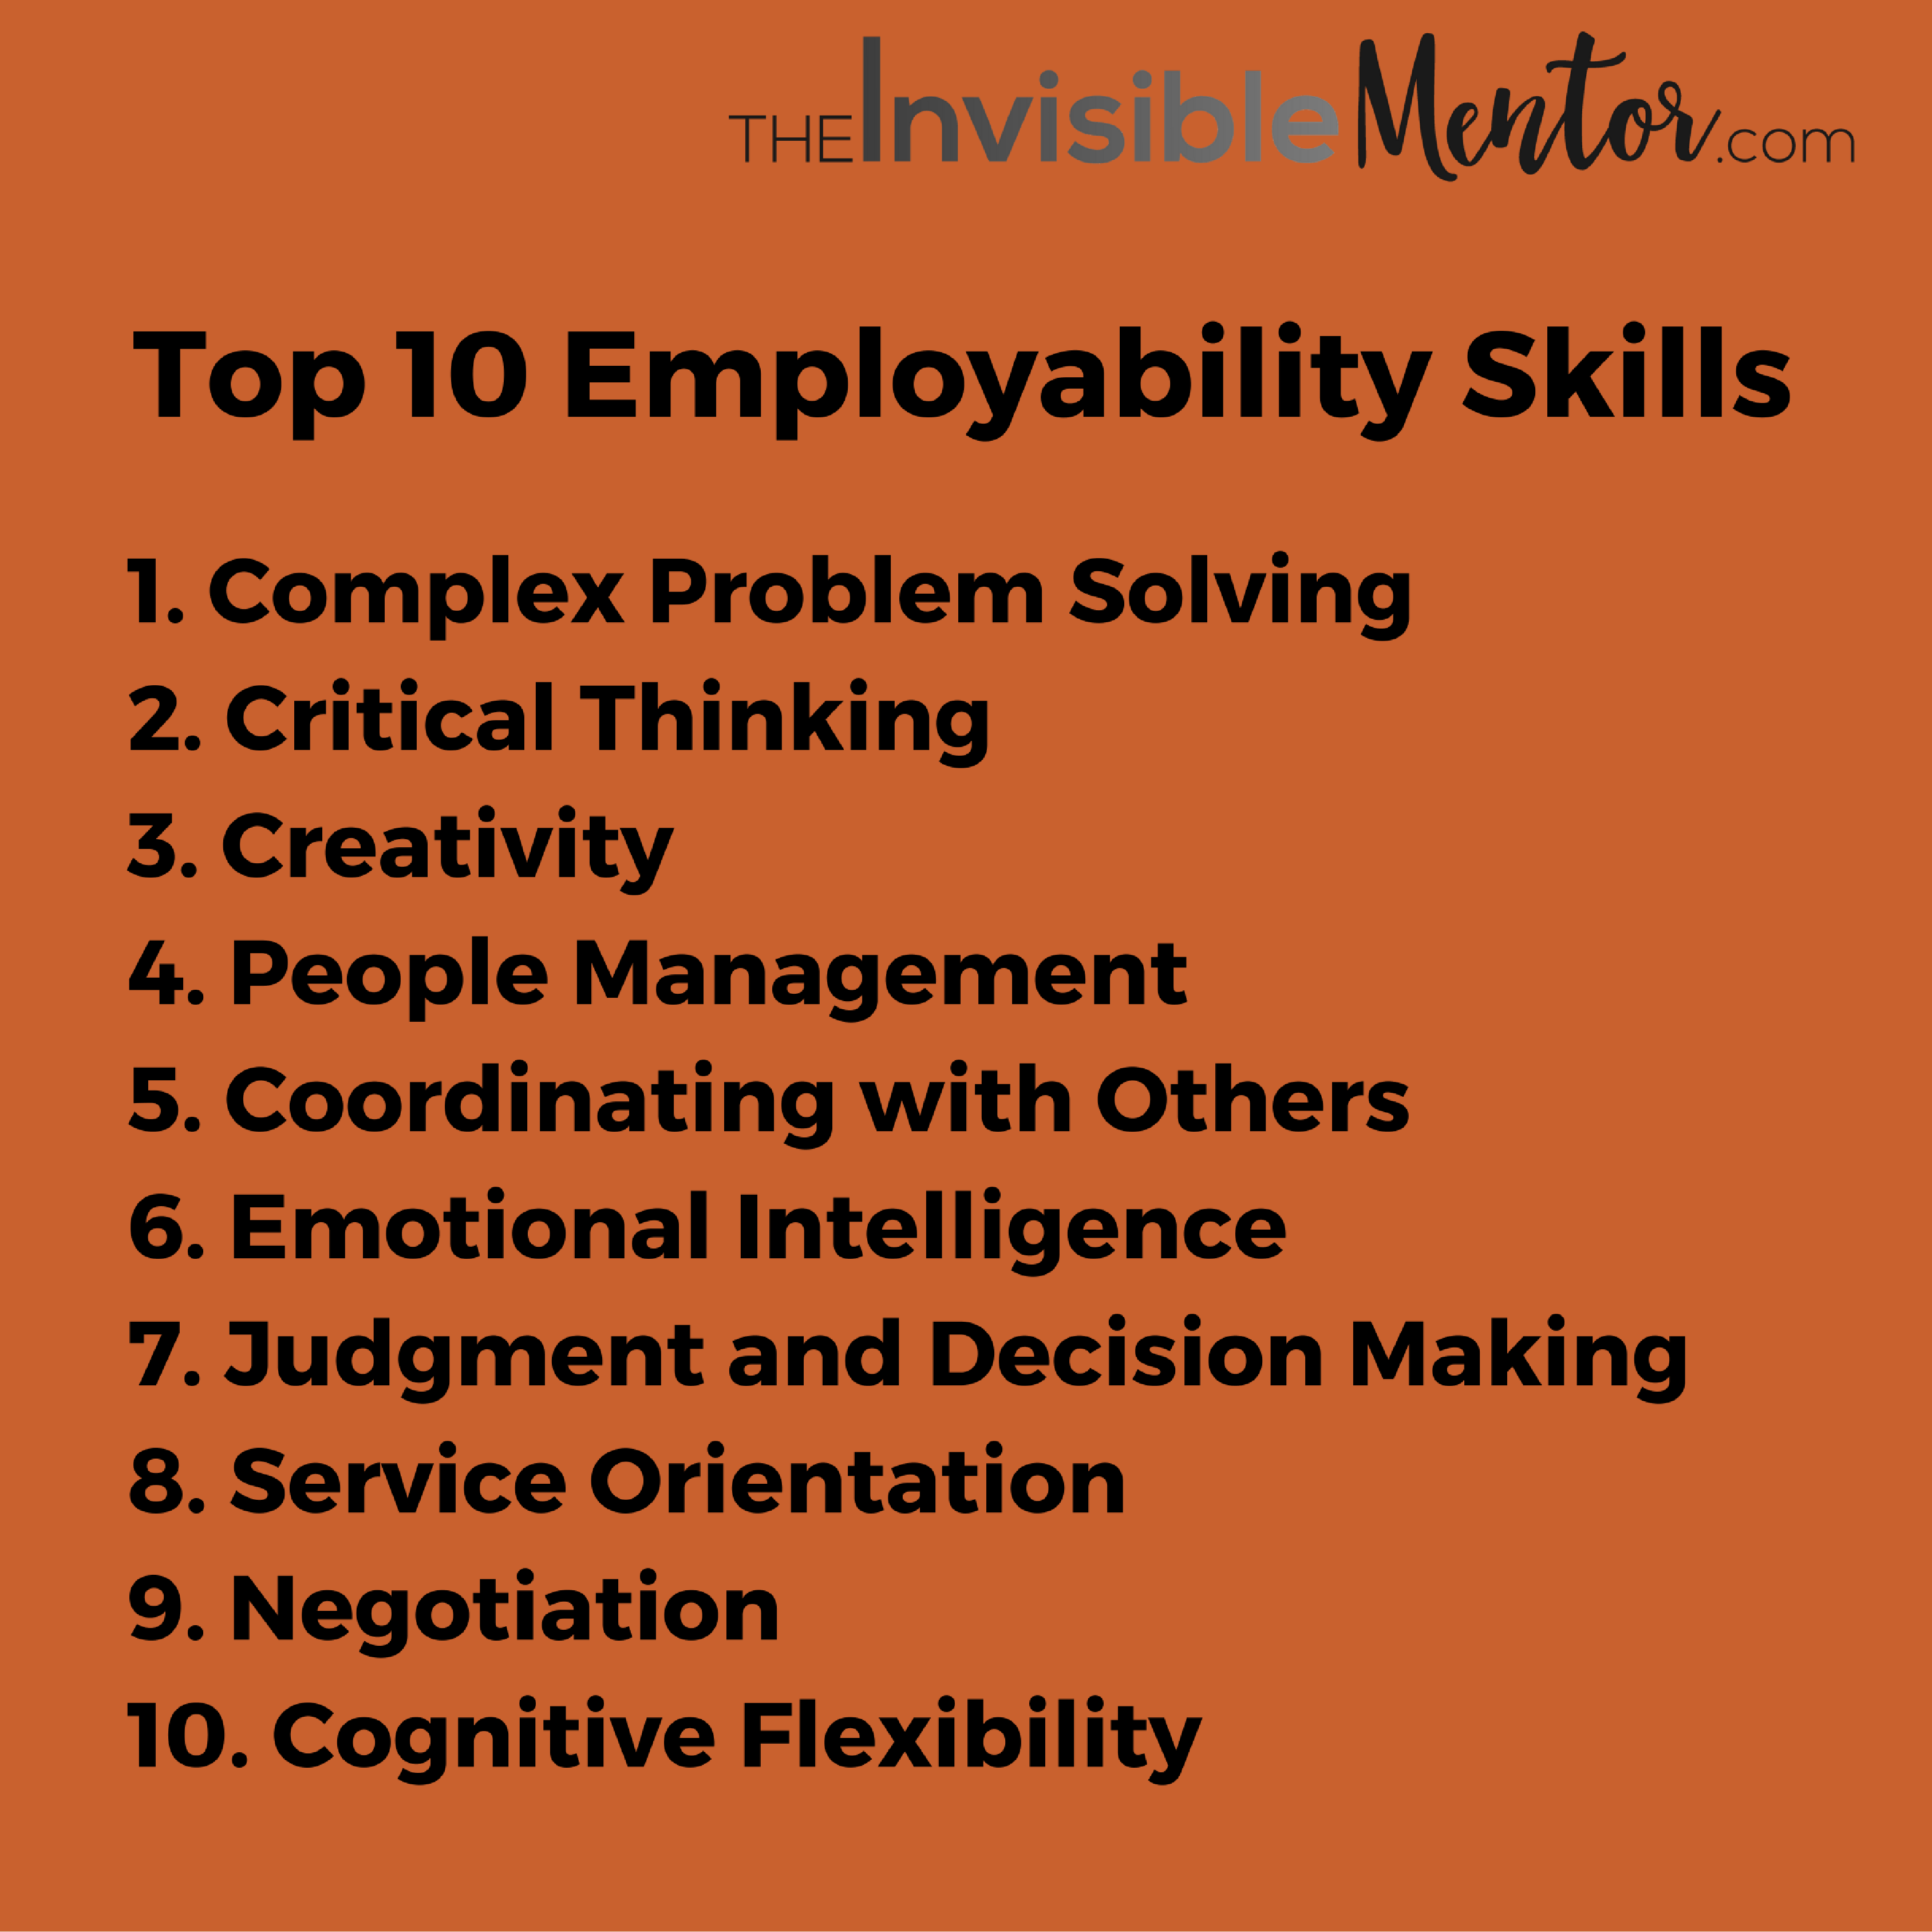 top 10 employability skills,Skills Needed for Future Jobs